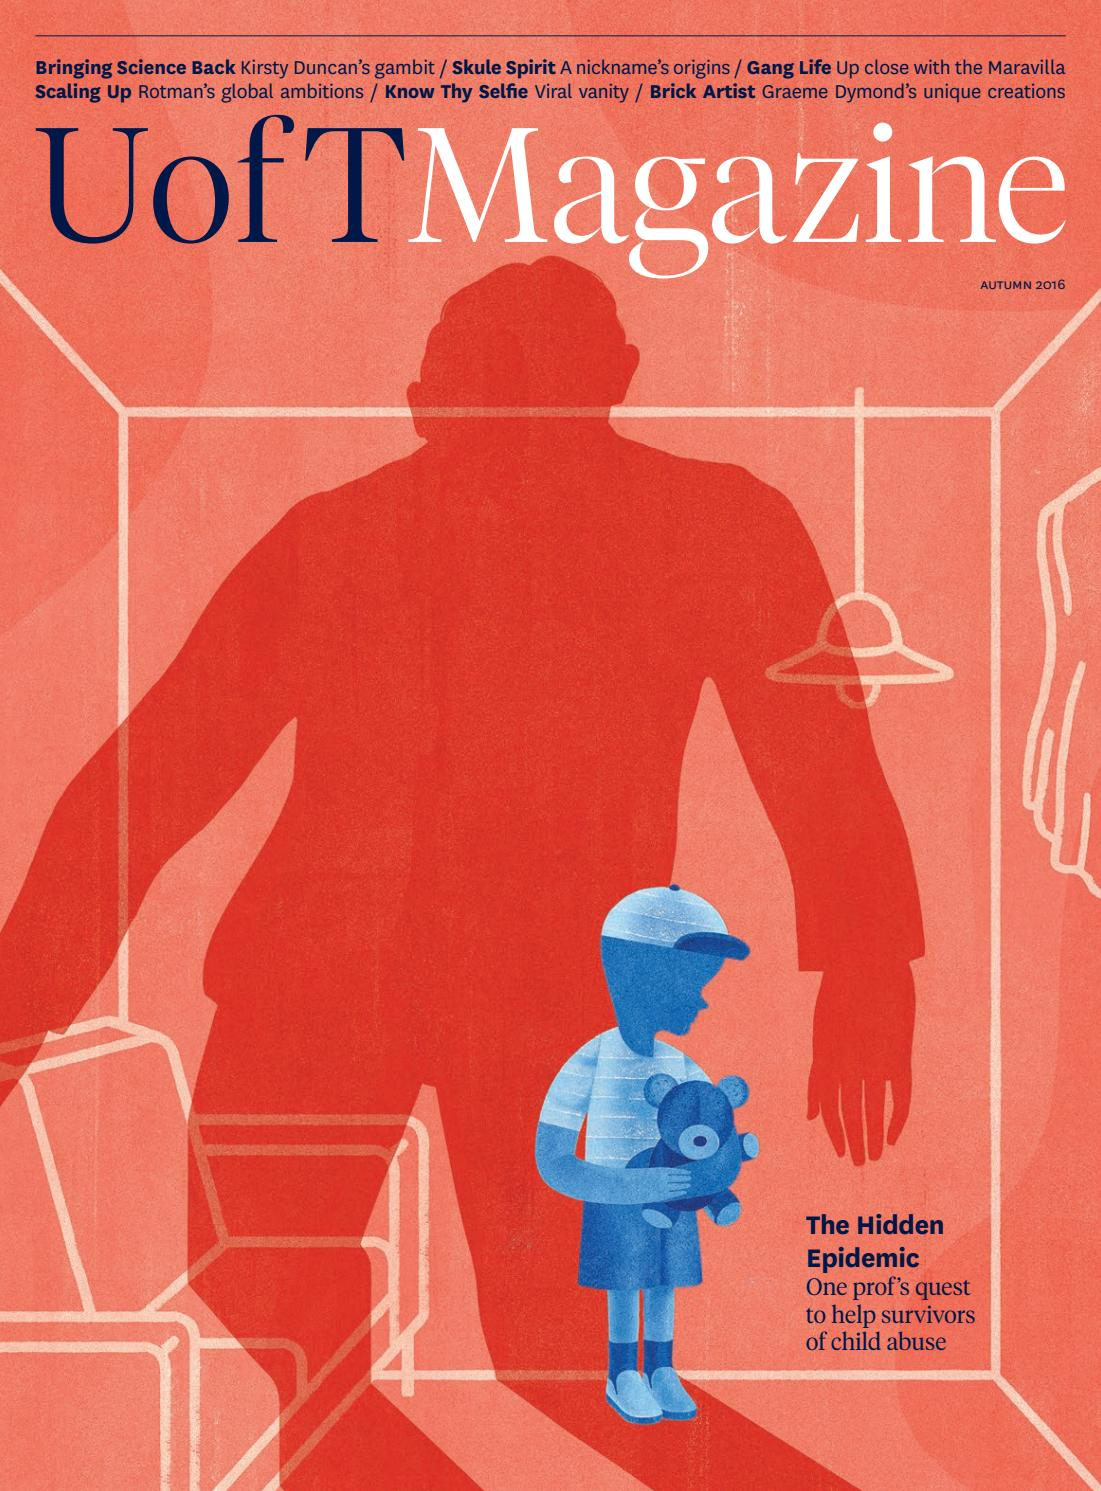 U of T Magazine   Autumn 2016 by University of Toronto